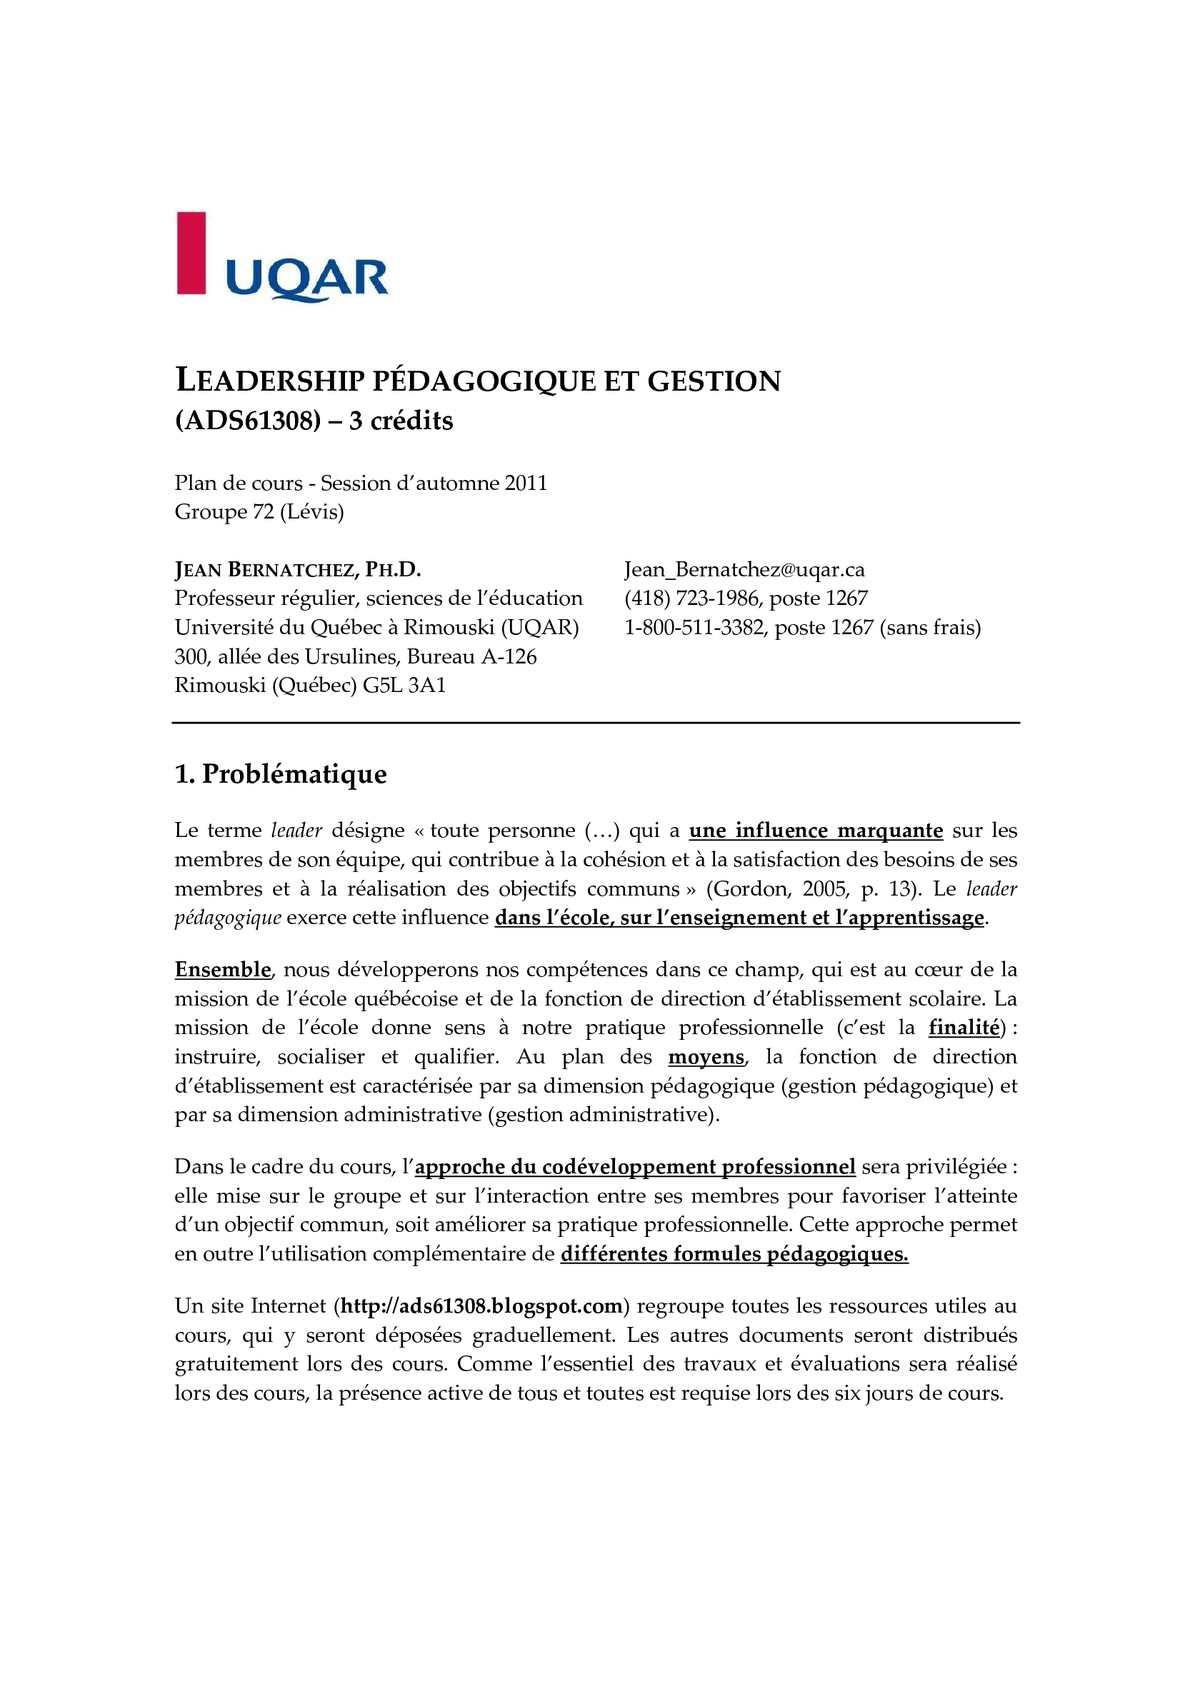 Gestion Plan De Calaméo Pédagogique Et CoursLeadership vIYf6yb7g